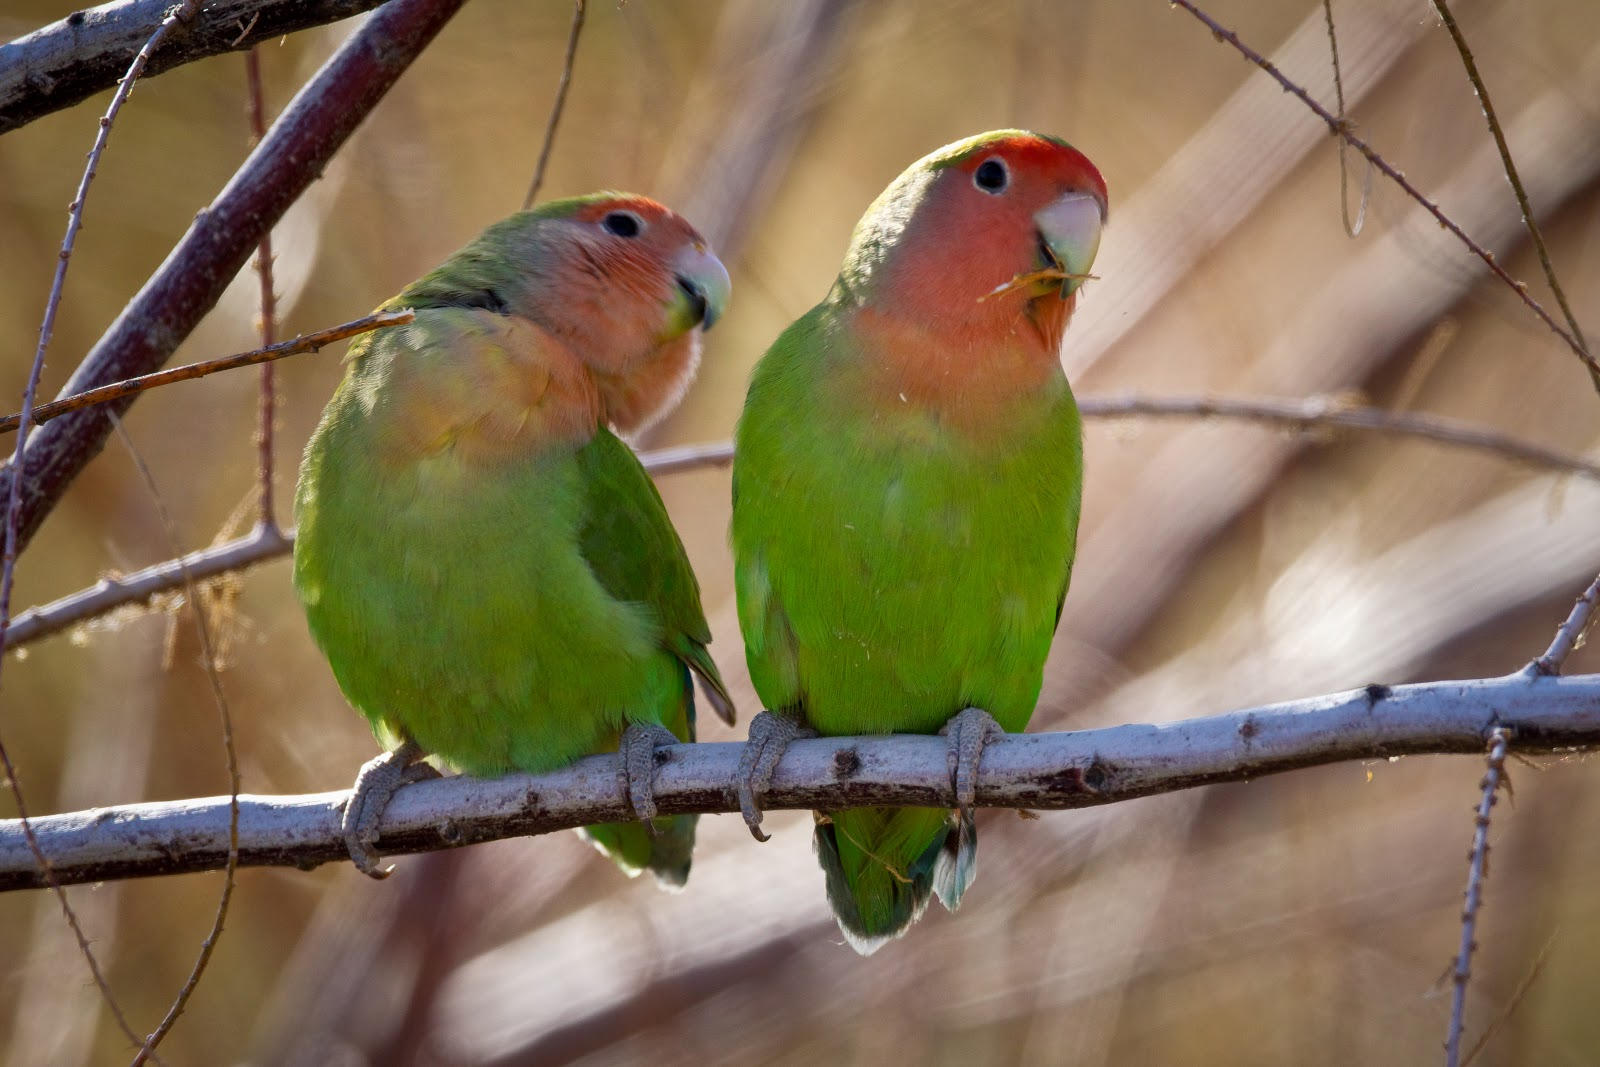 towns lovebirds by glassesgator - photo #20